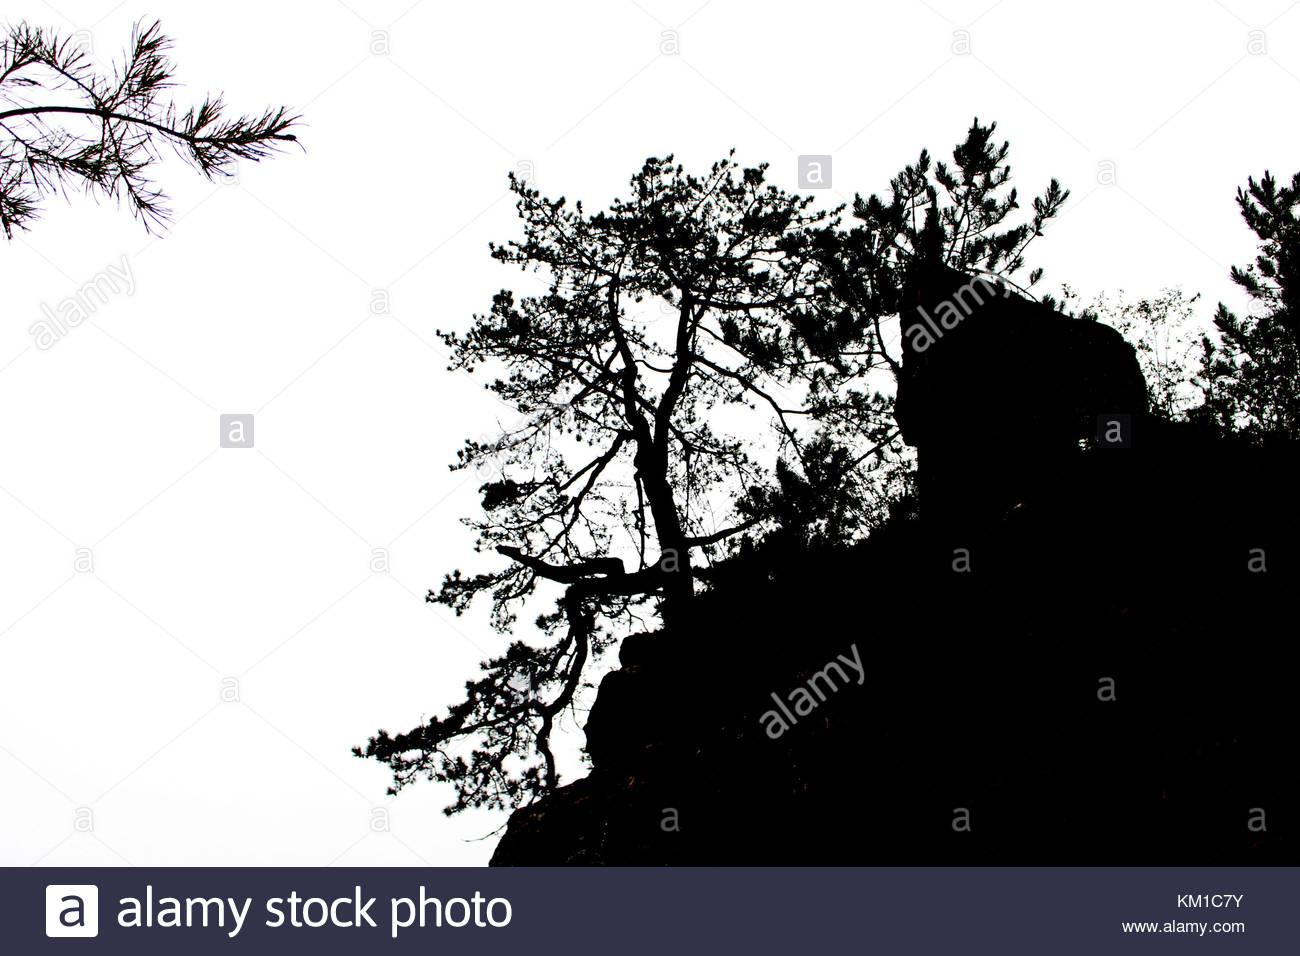 Mountains, trees, silhouettes - Stock Image